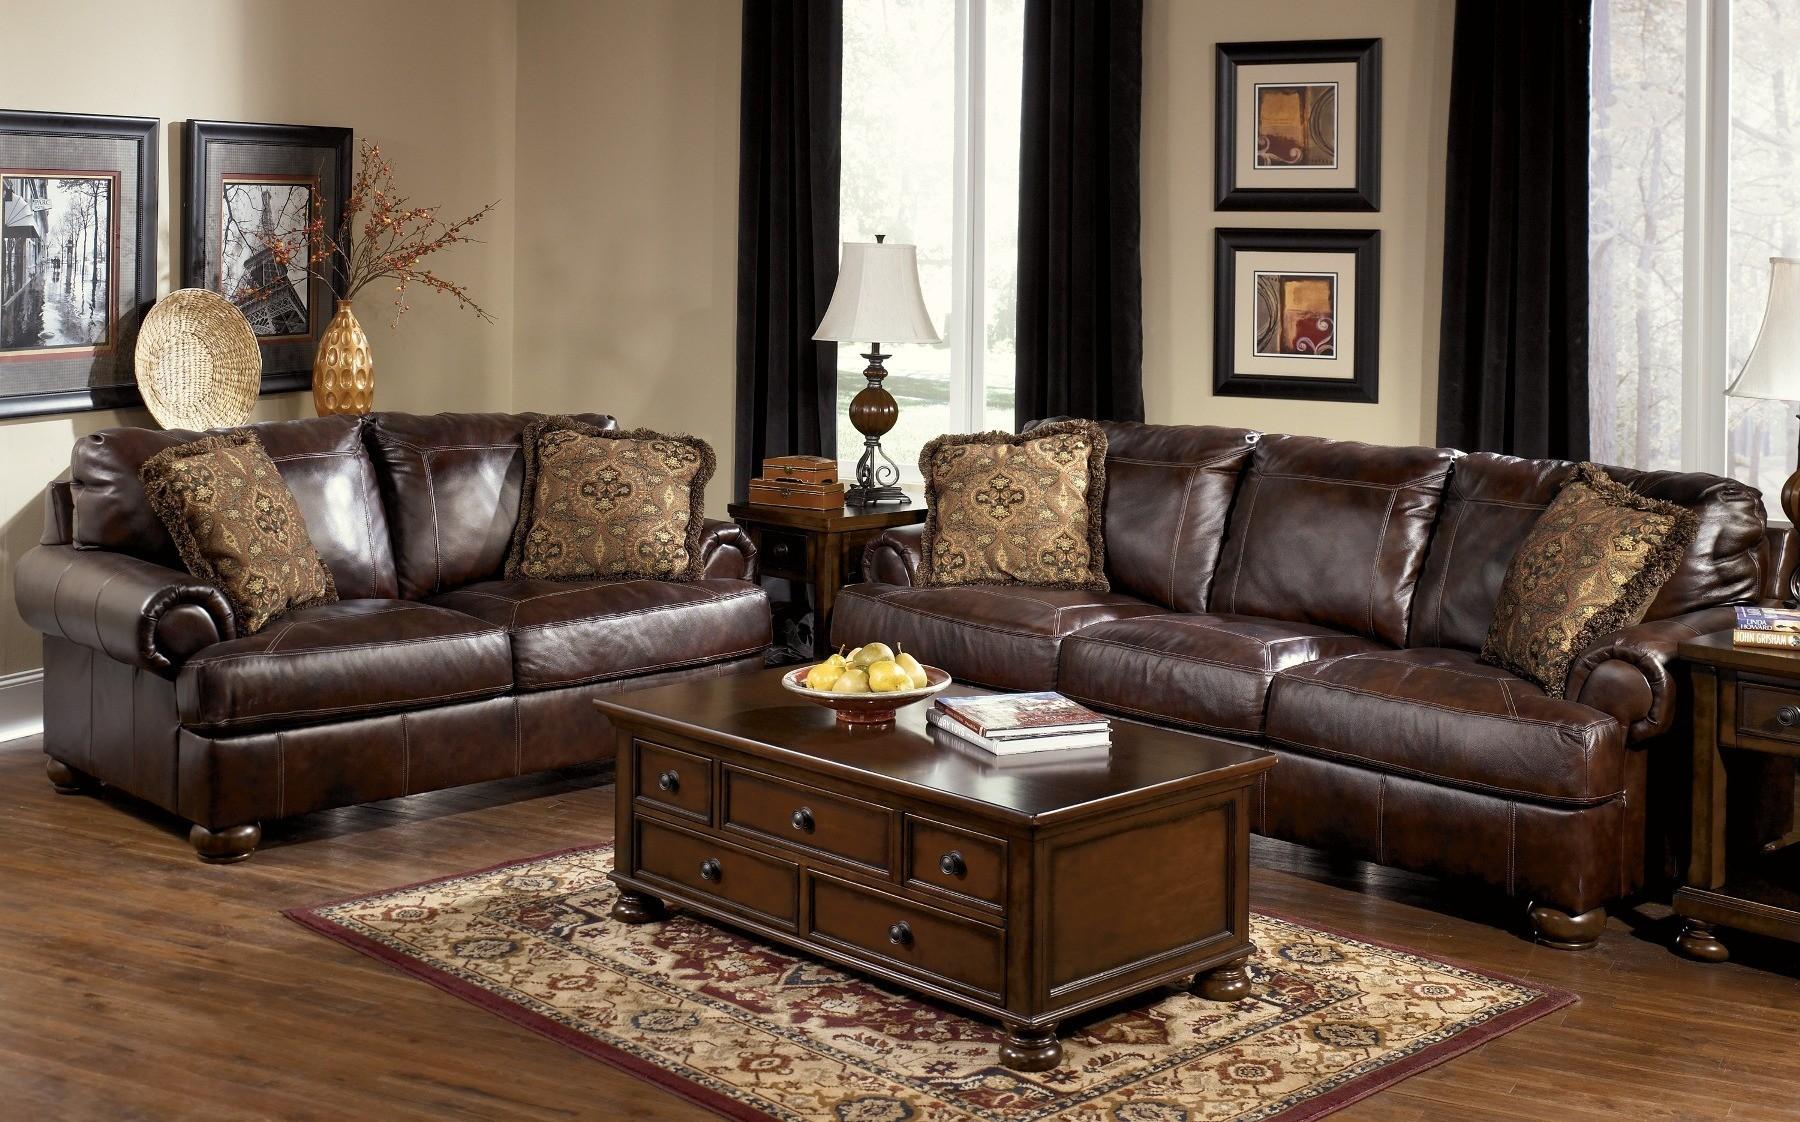 Axiom Walnut Living Room Set From Ashley 42000 Coleman